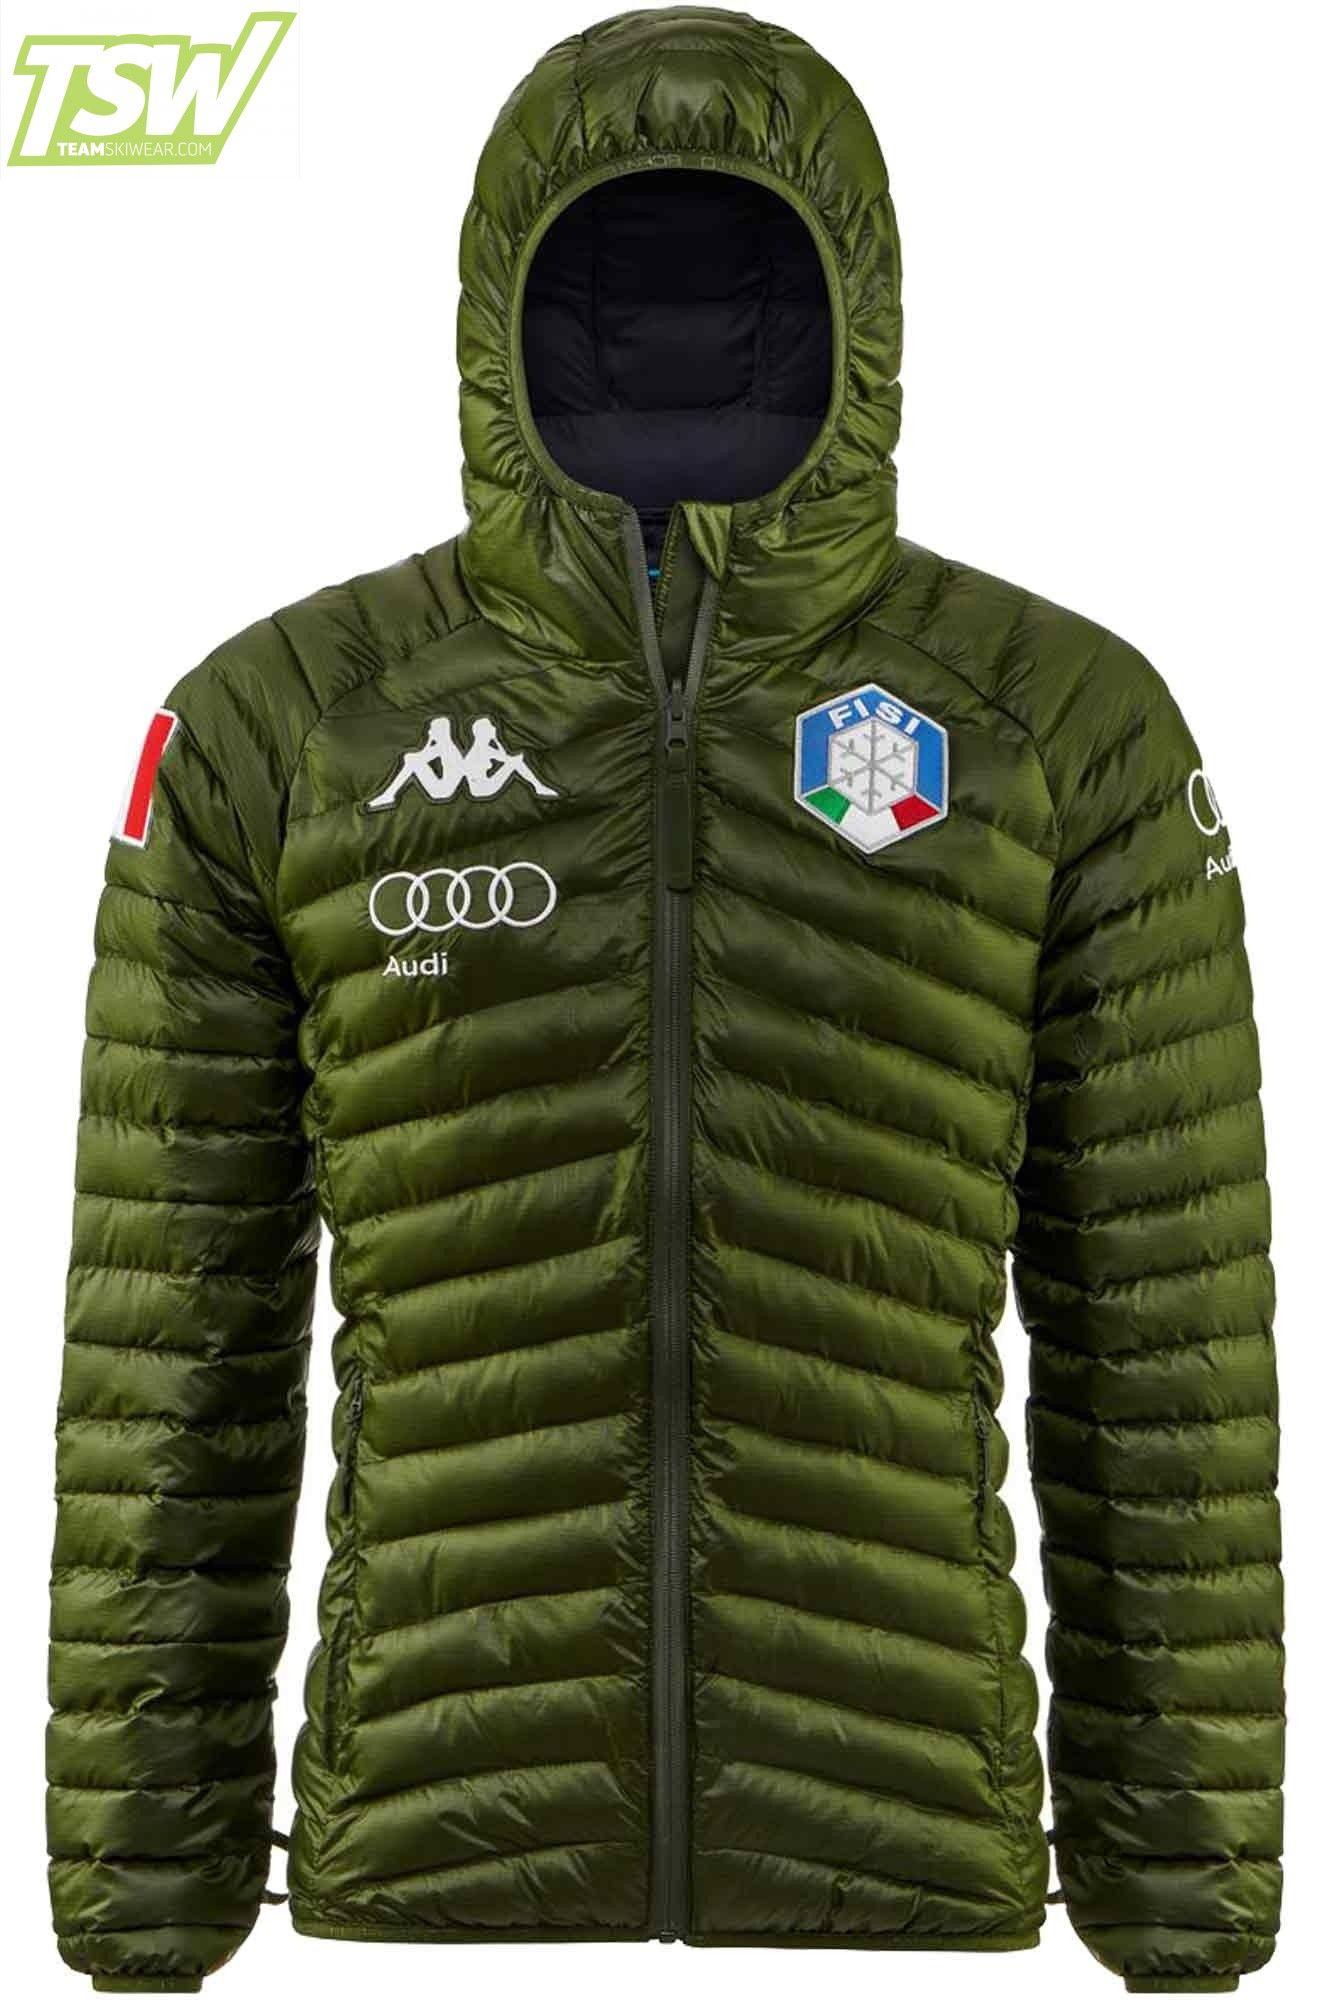 Kappa Men Italia FISI Team Insulator Jacket Green Blue